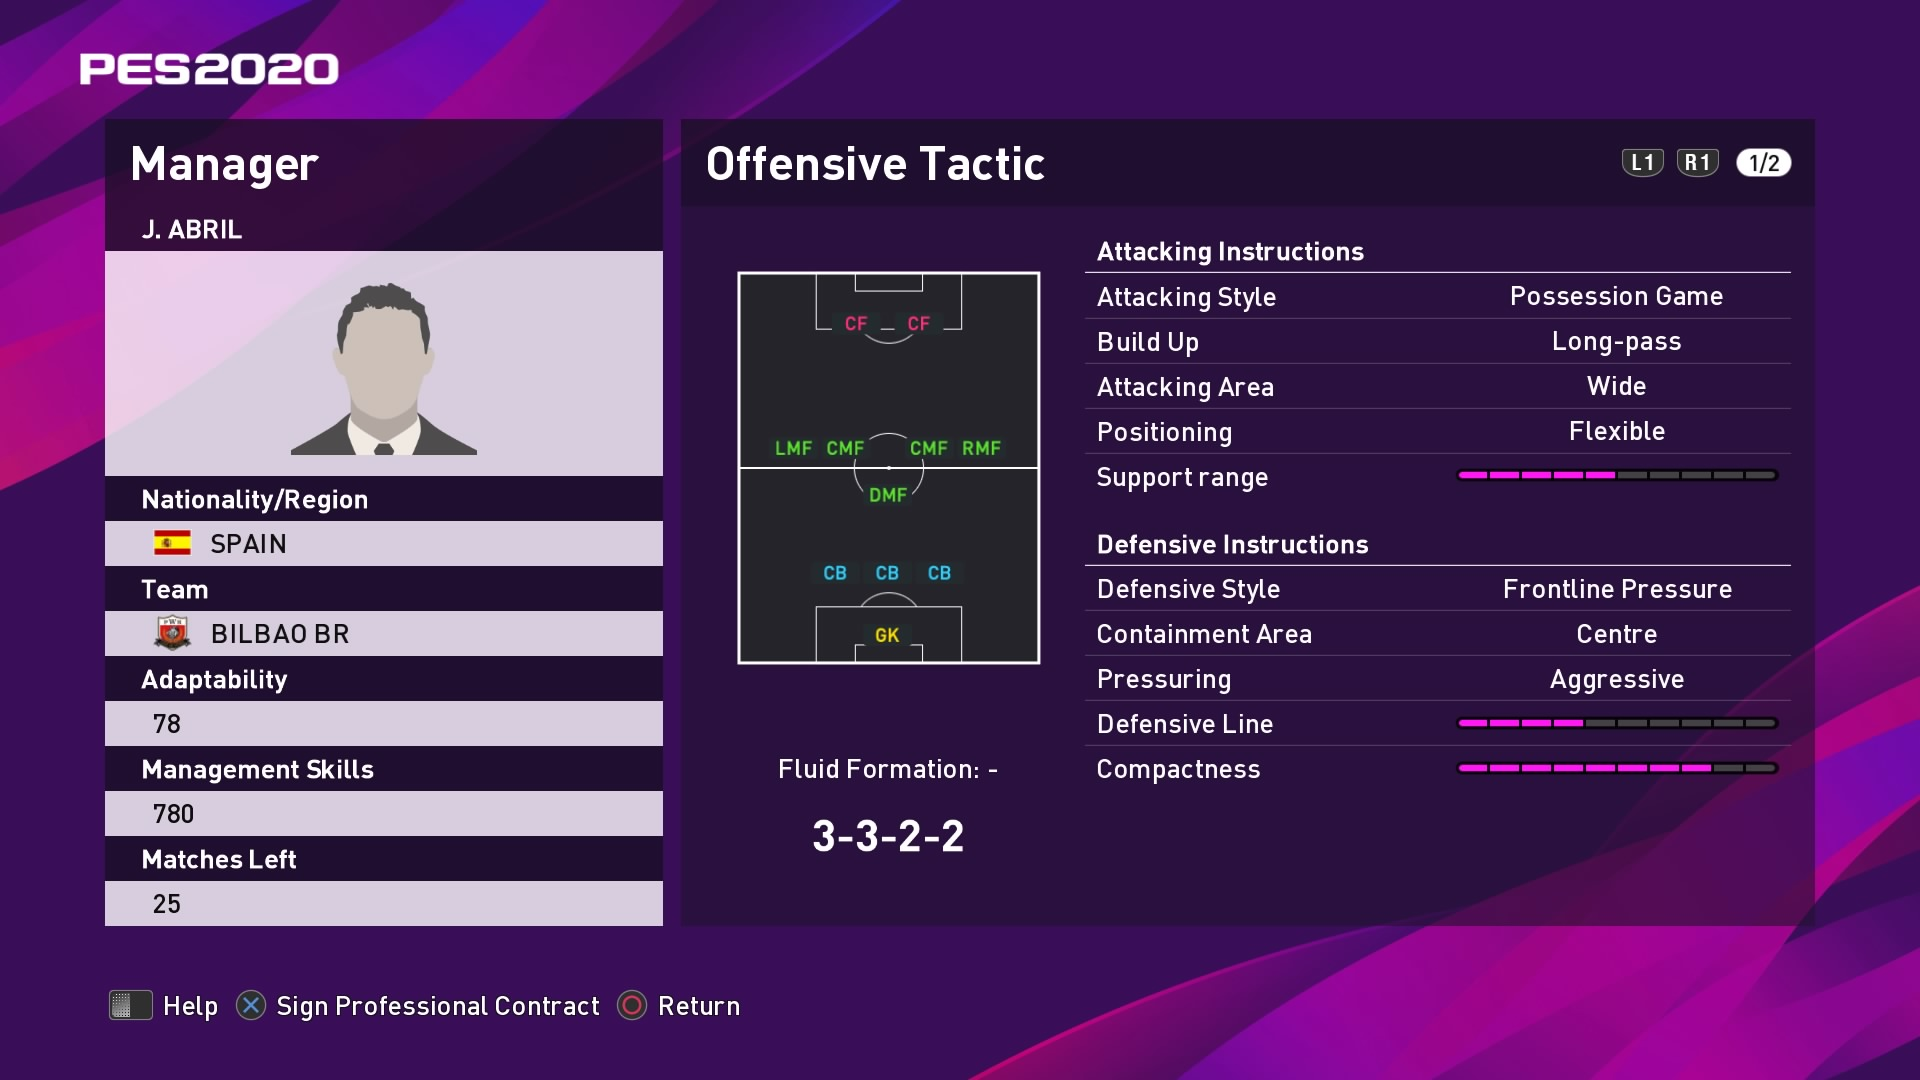 J. Abril (Gaizka Garitano) Offensive Tactic in PES 2020 myClub